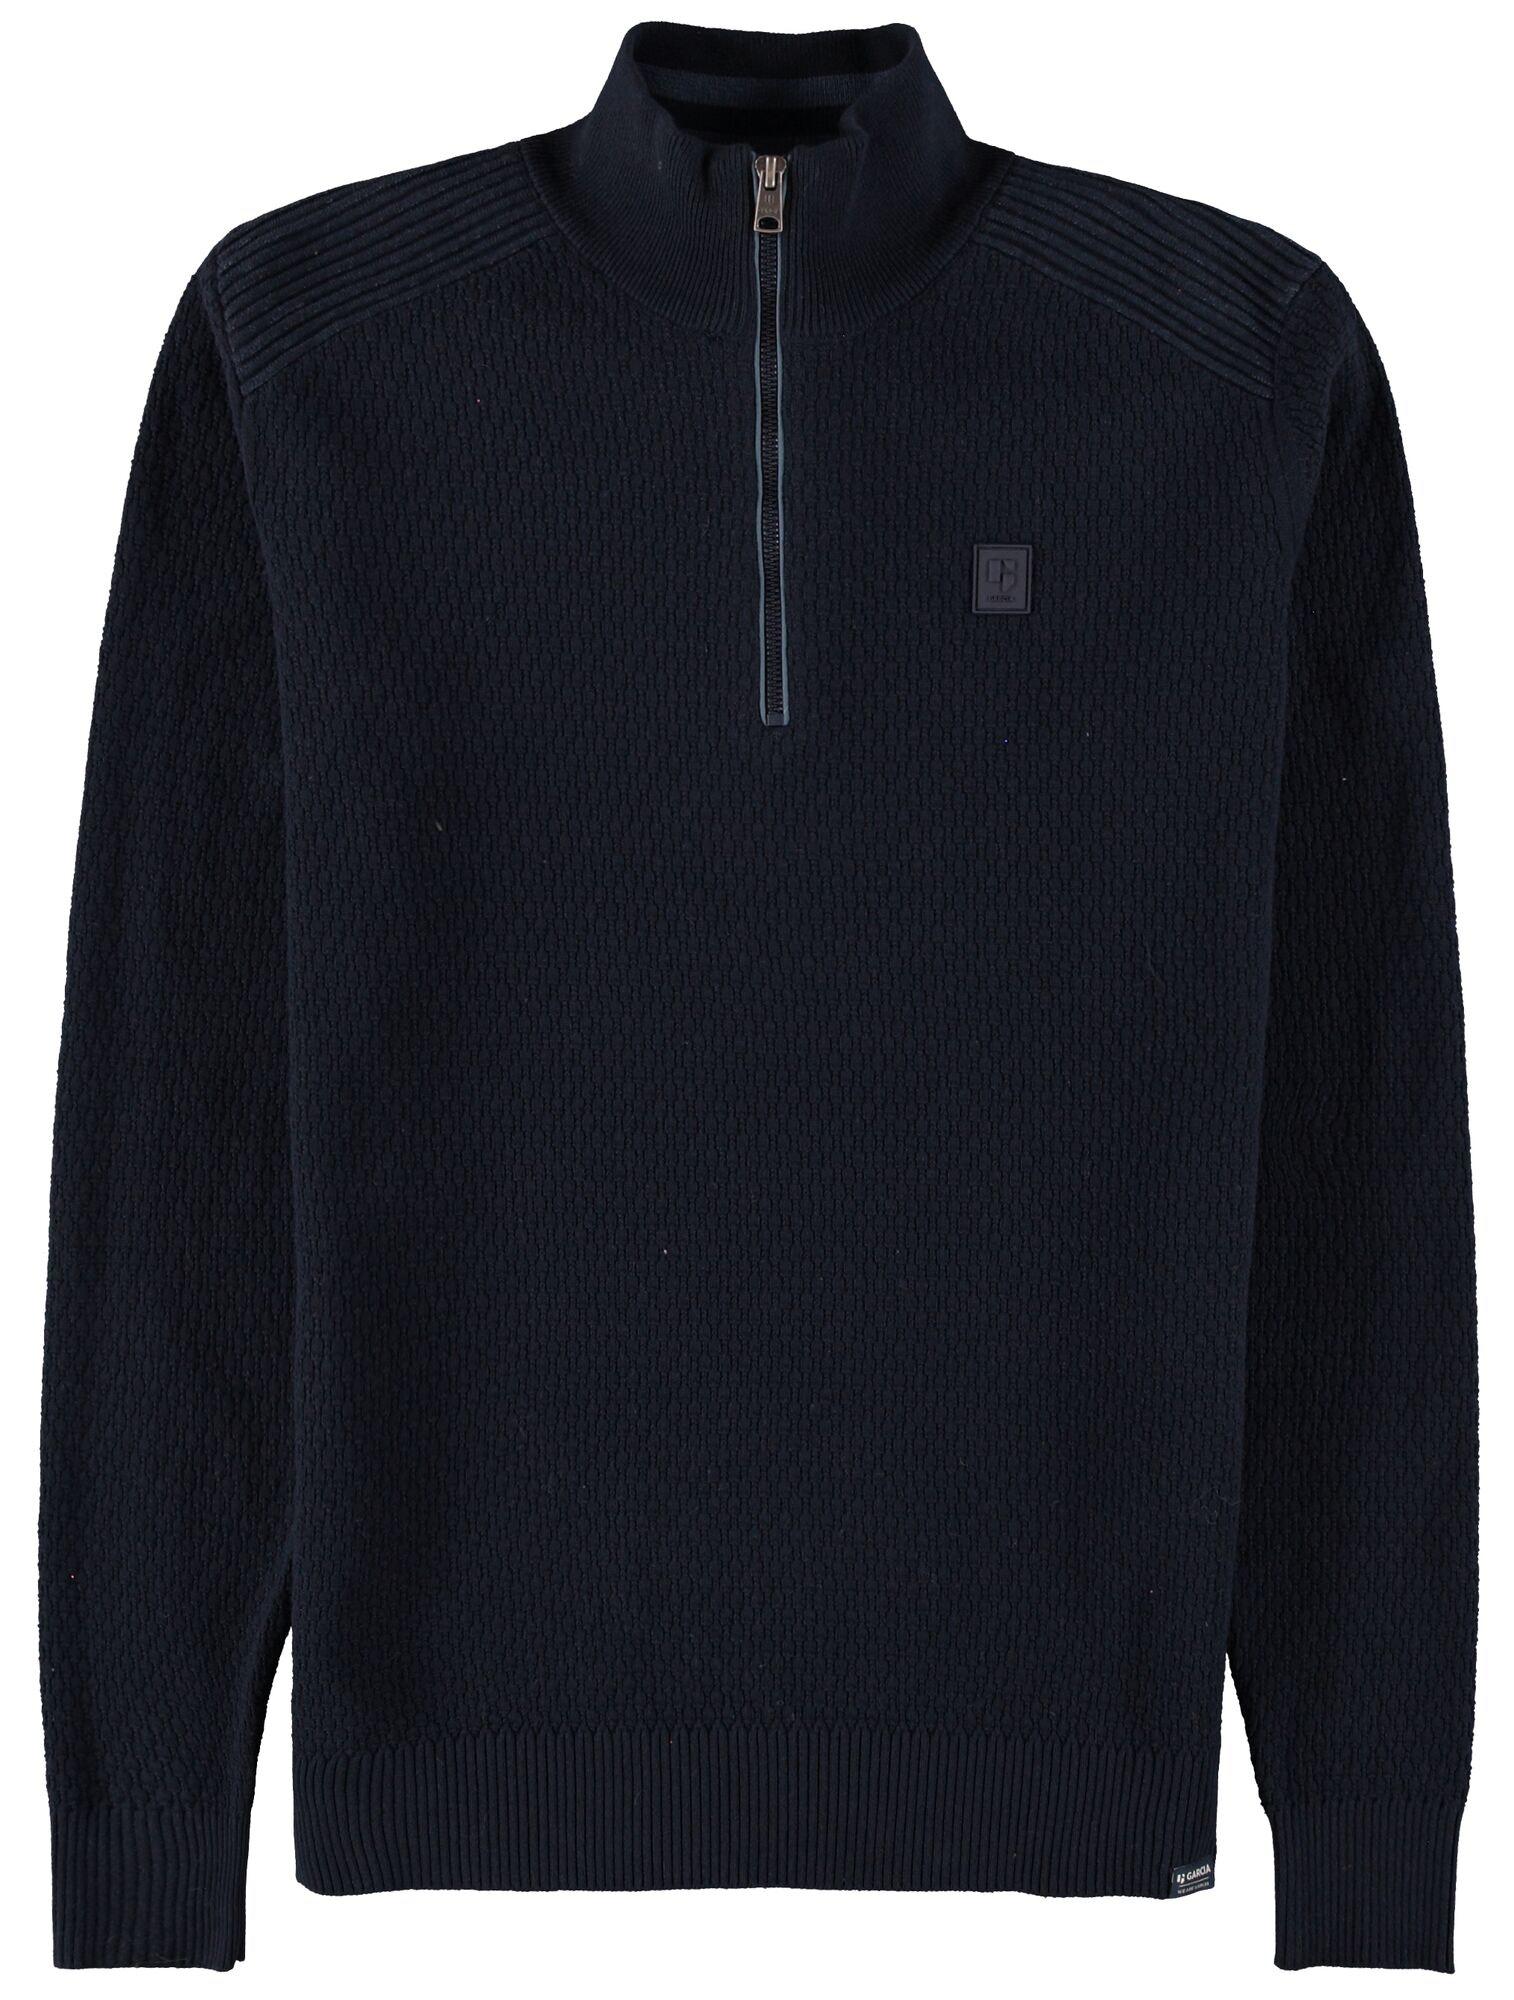 T01241_men`s pullover